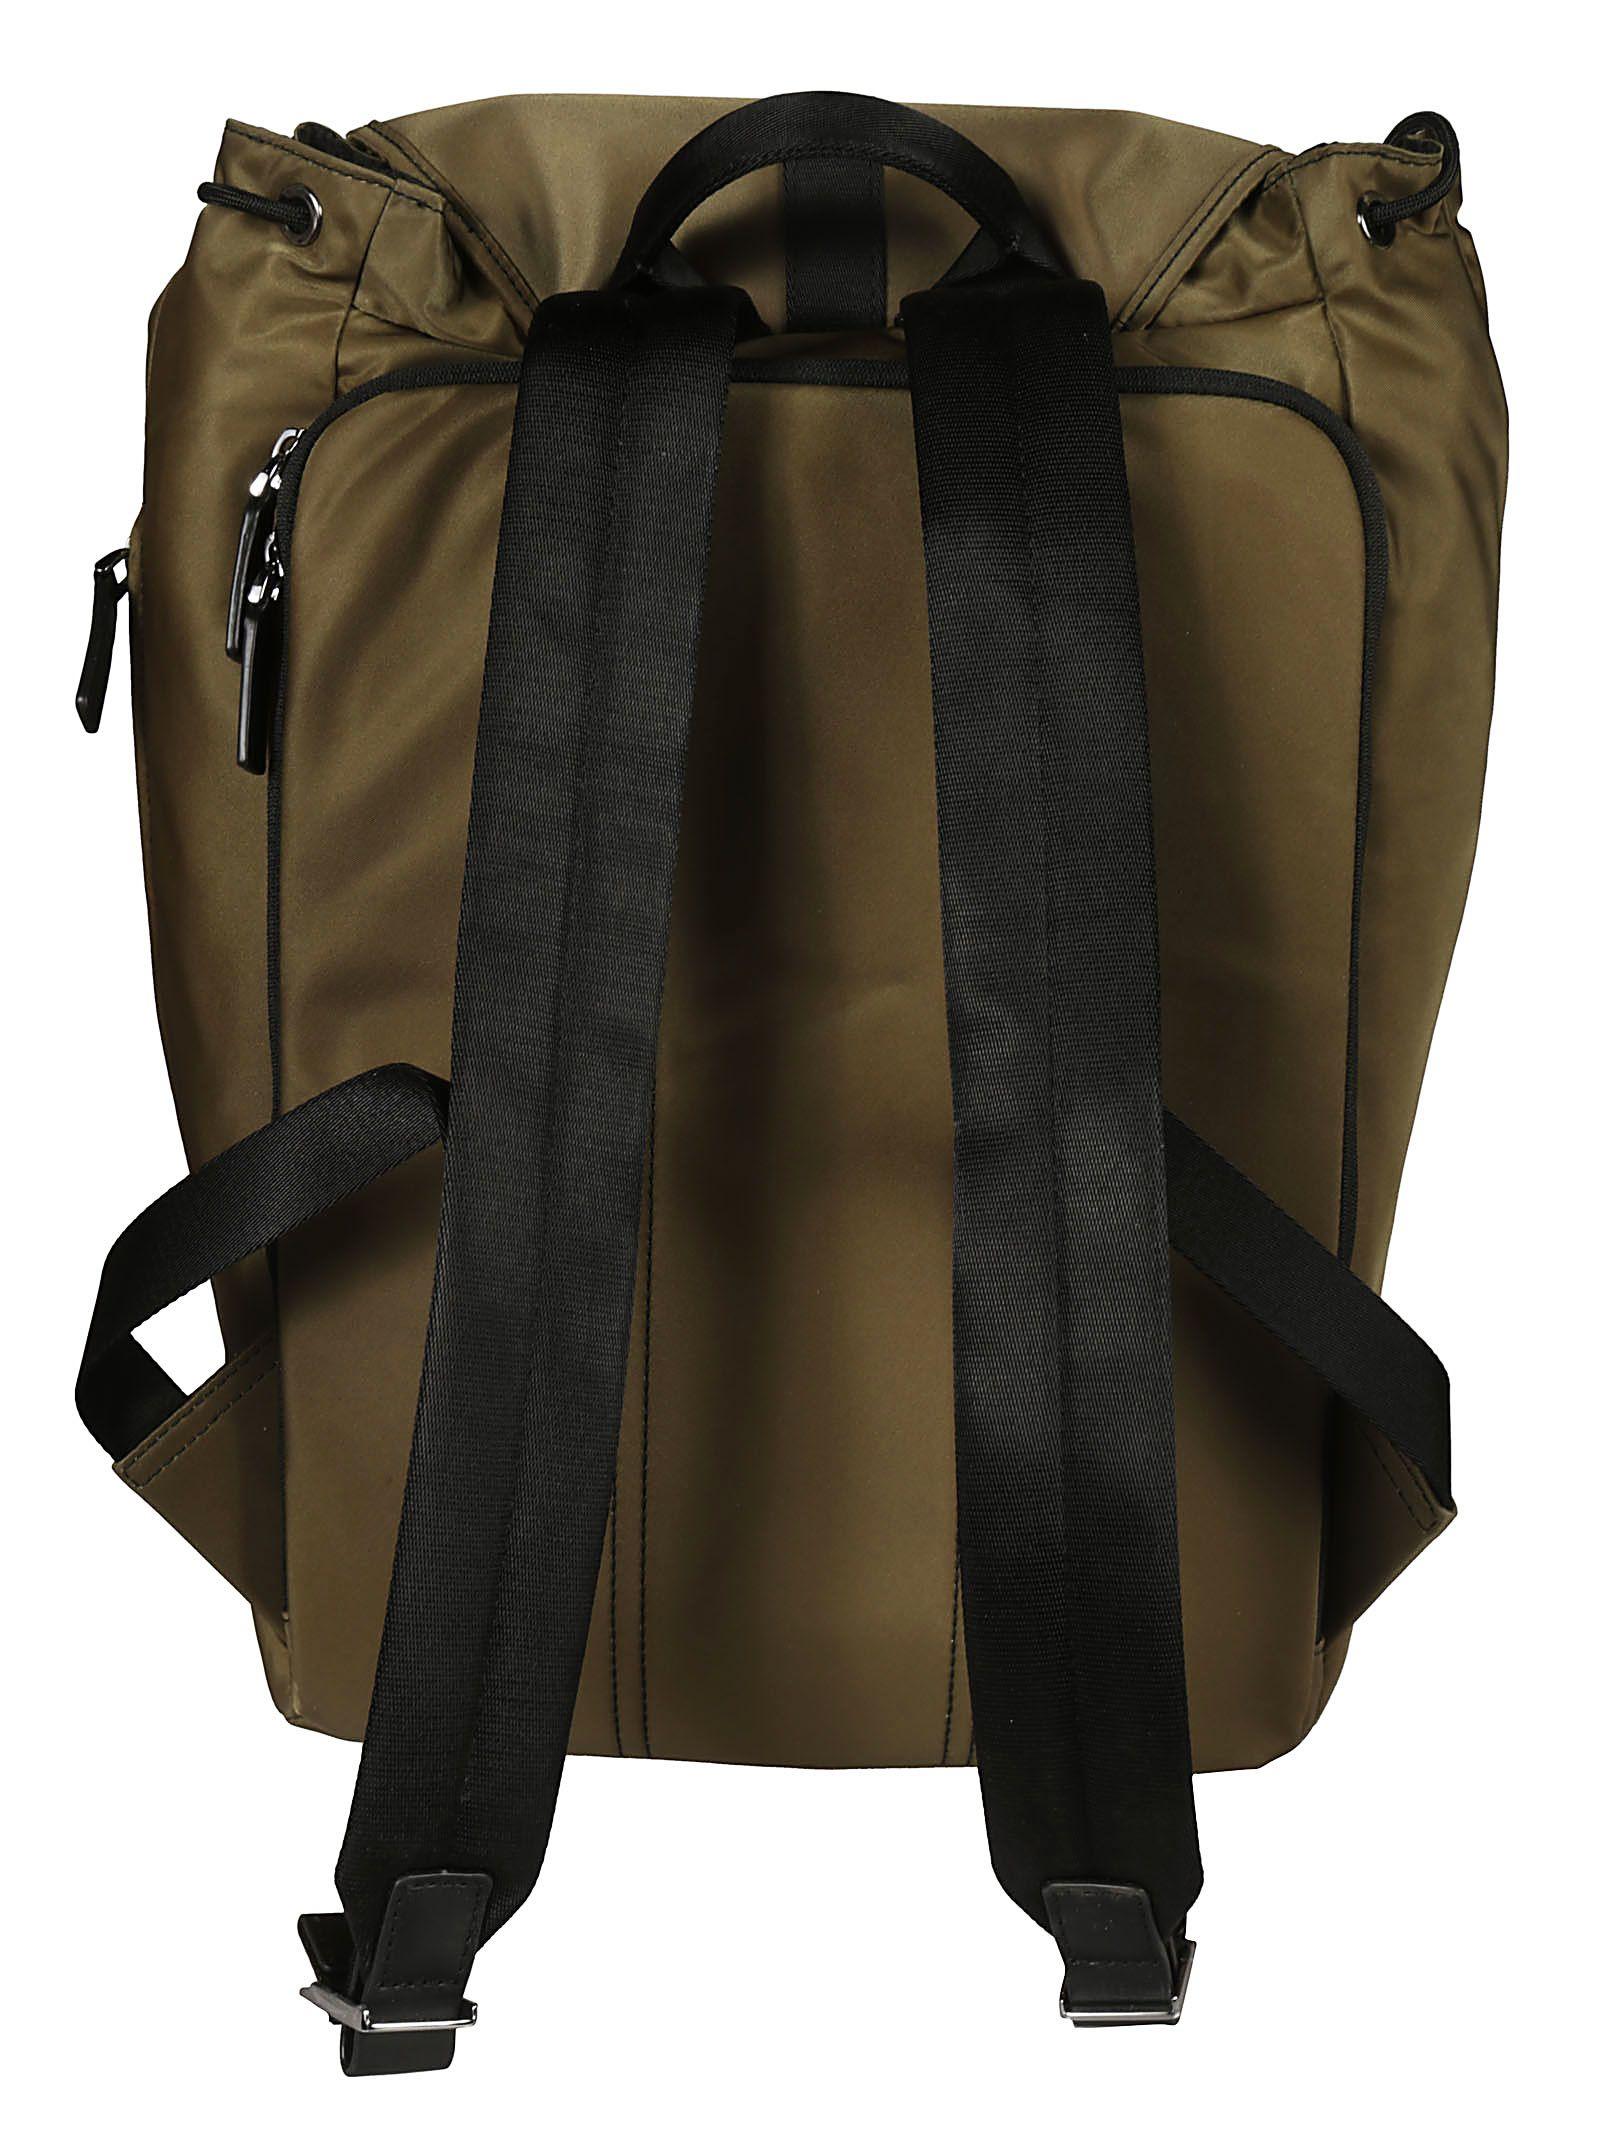 aed2ef0f74b4 Michael Kors Kent Nylon Drawstring Backpack – Patmo Technologies Limited